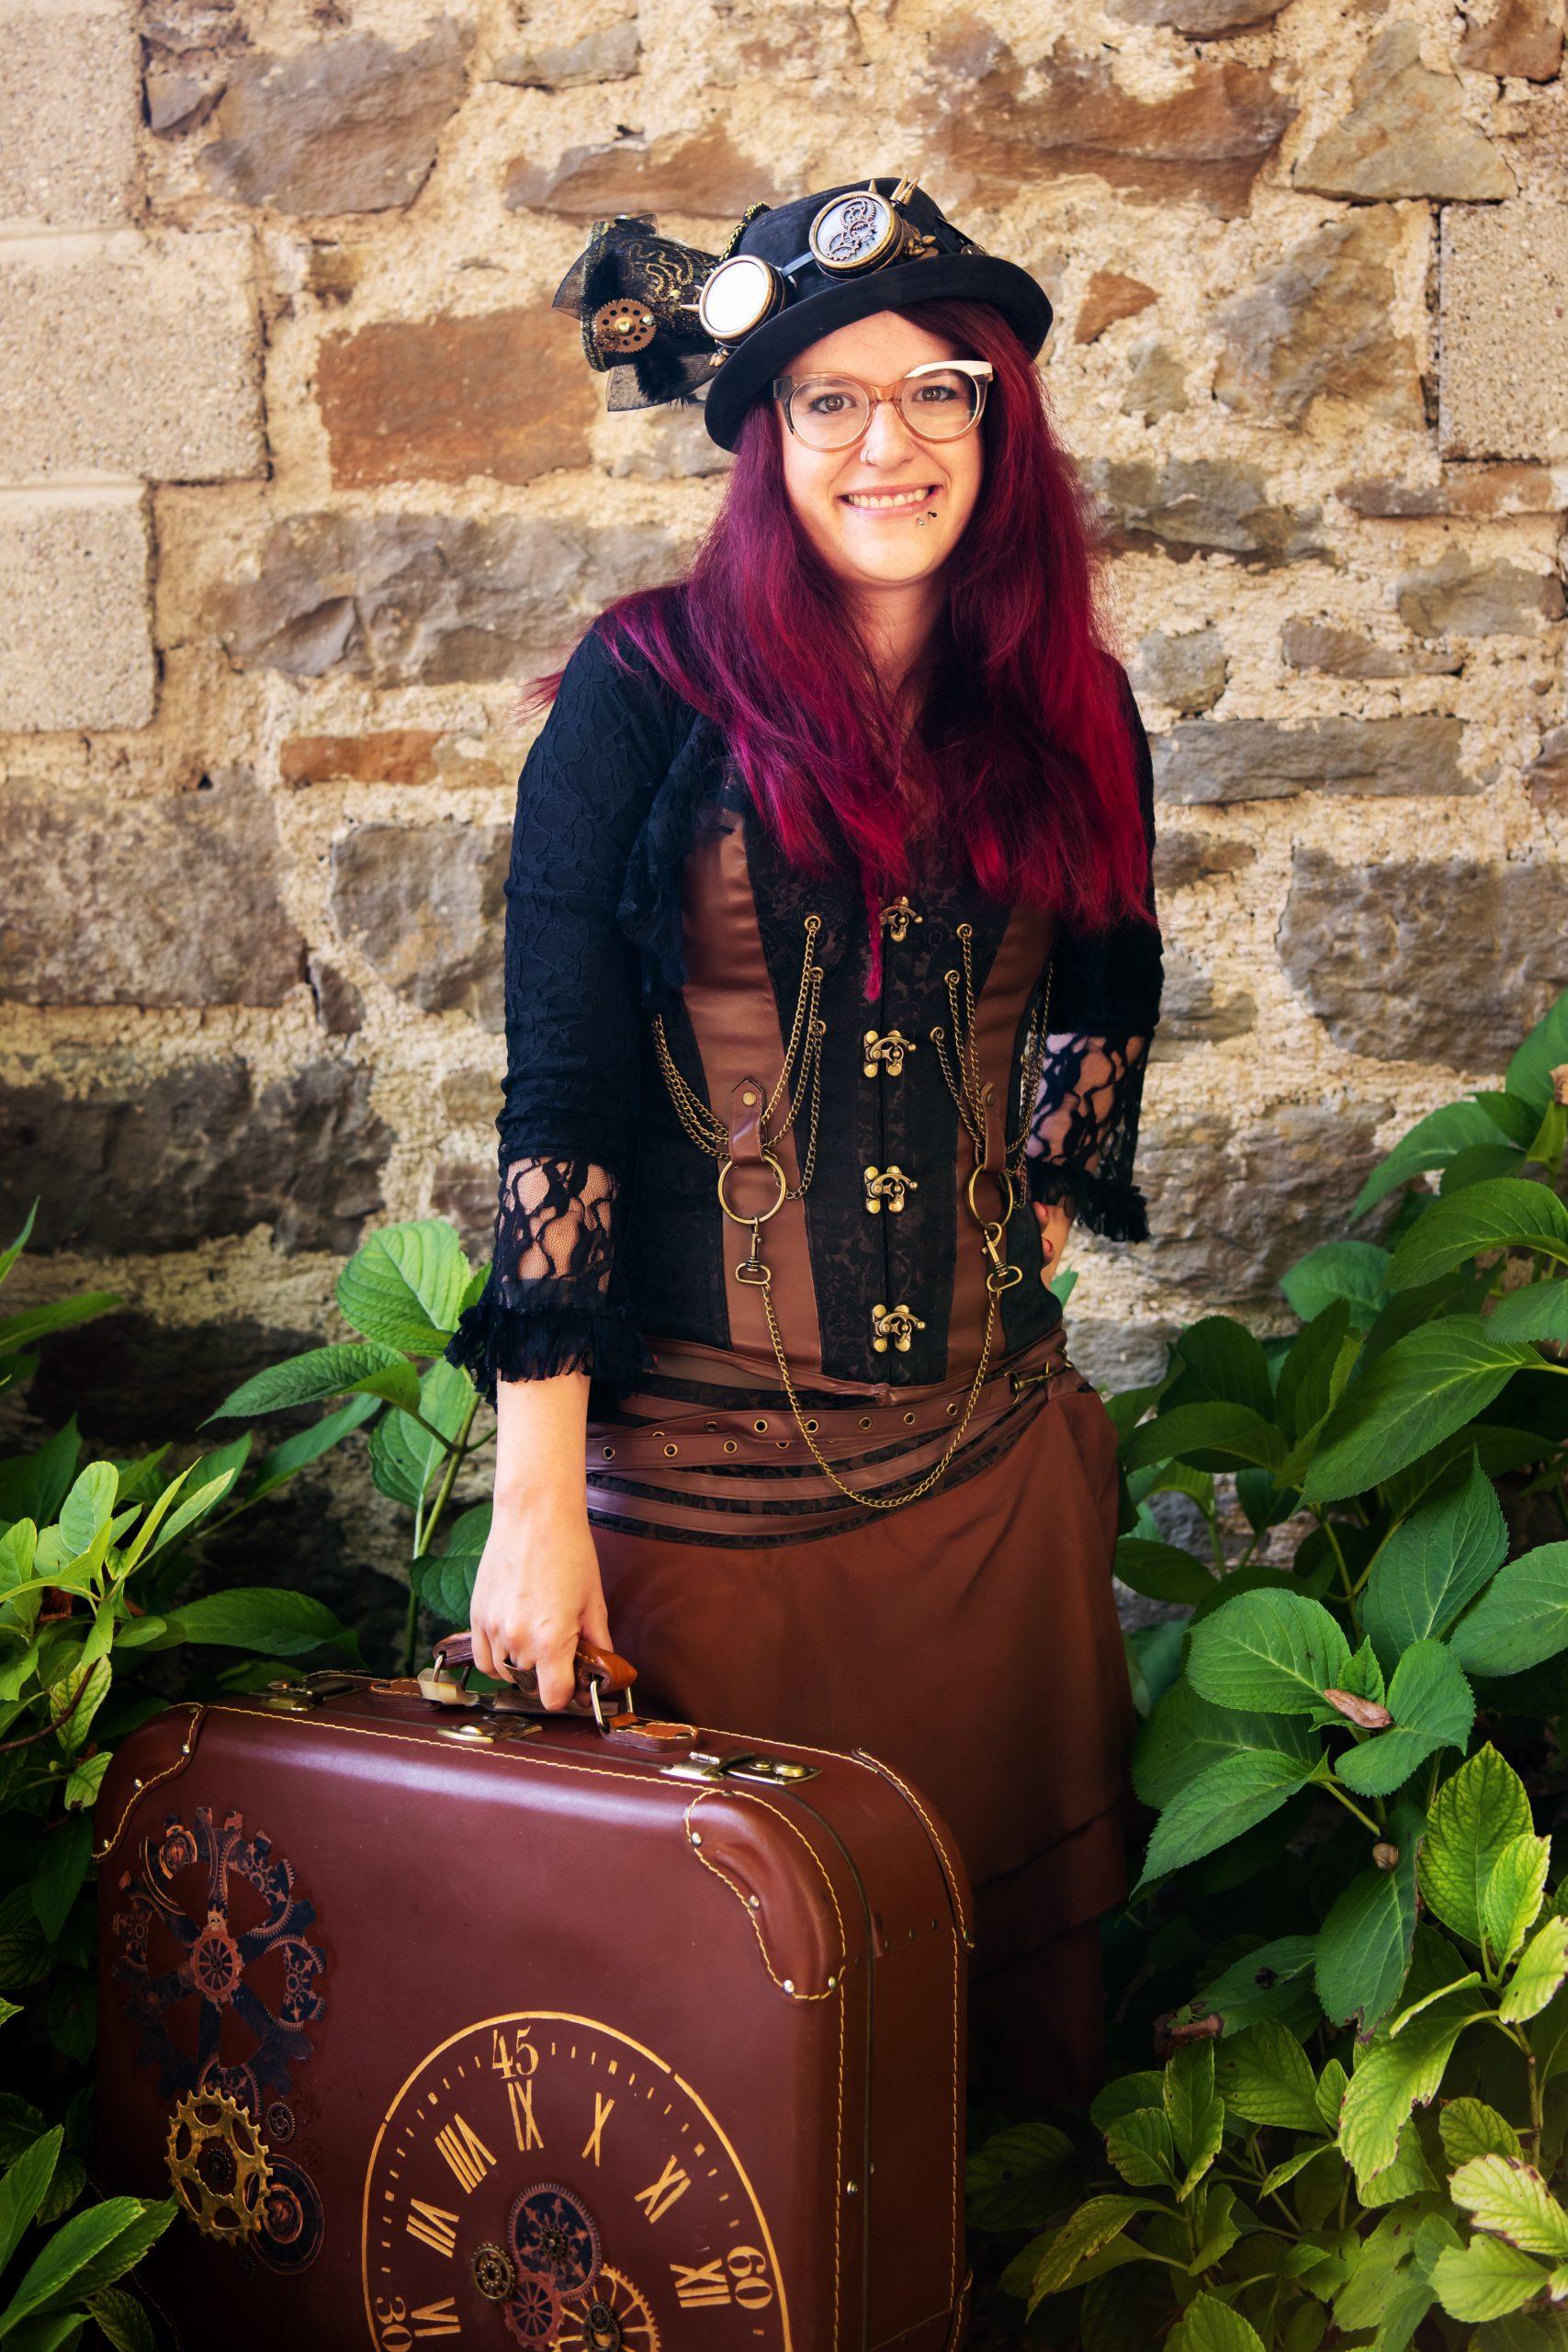 Zauberin mit Koffer